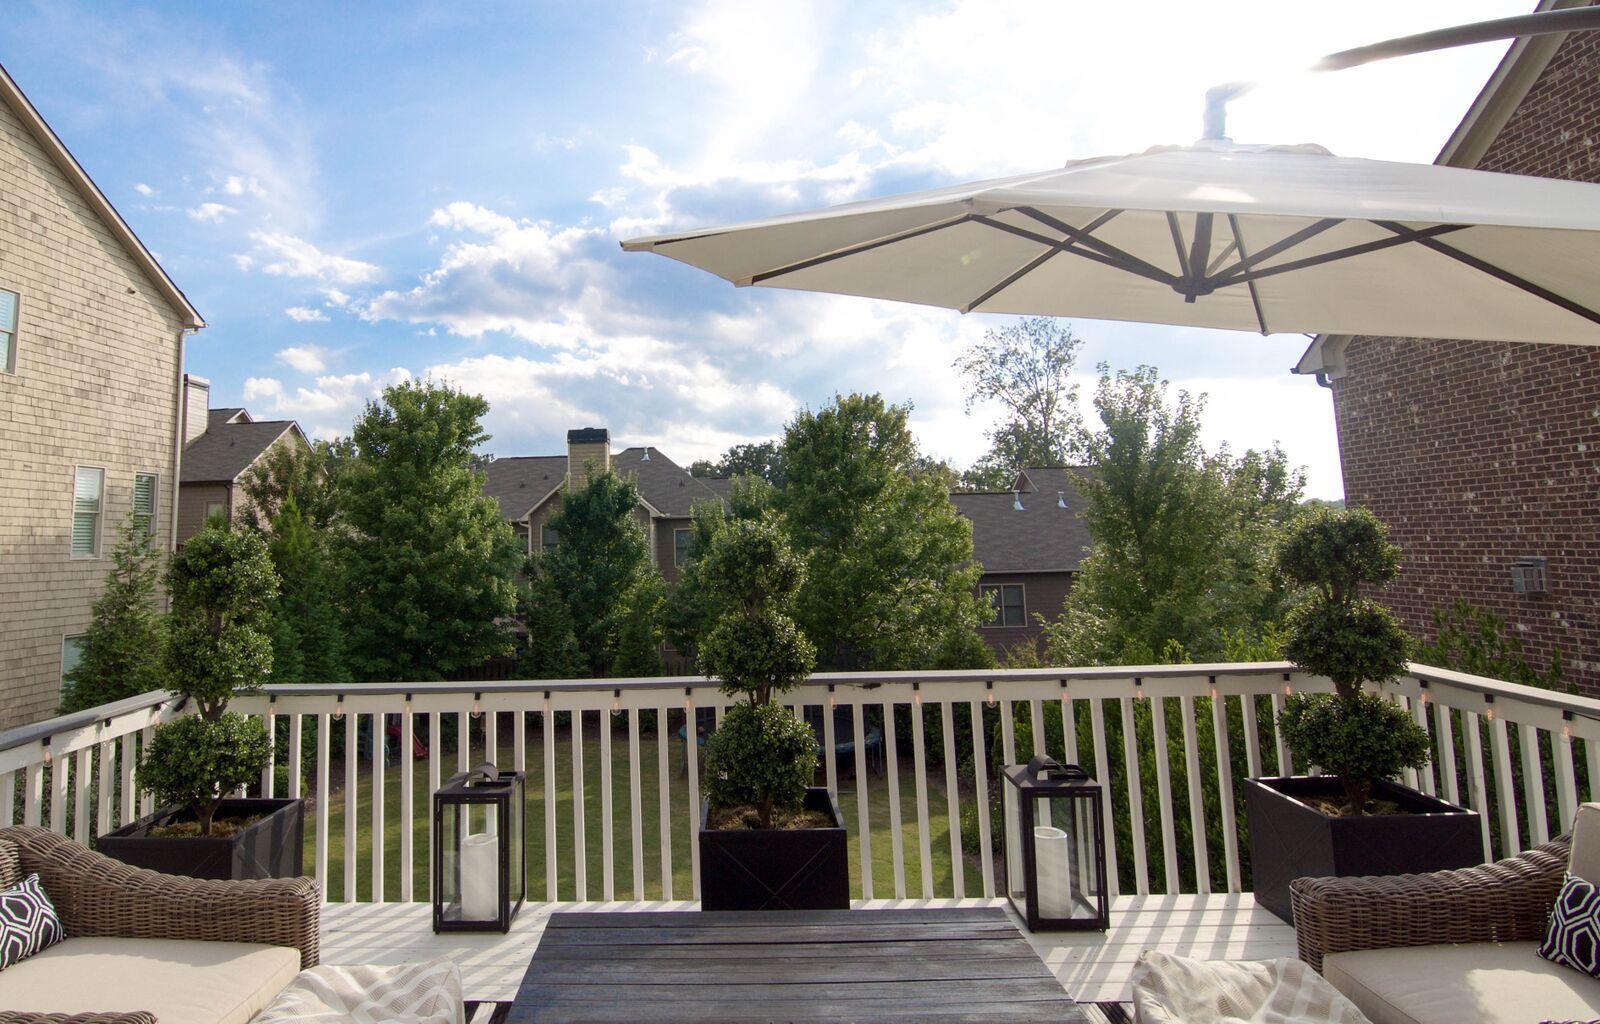 Outdoor Patio #outdoorspace #patiodecor #outdoorliving #southerliving # Southernpatio #patio #patioinsperation